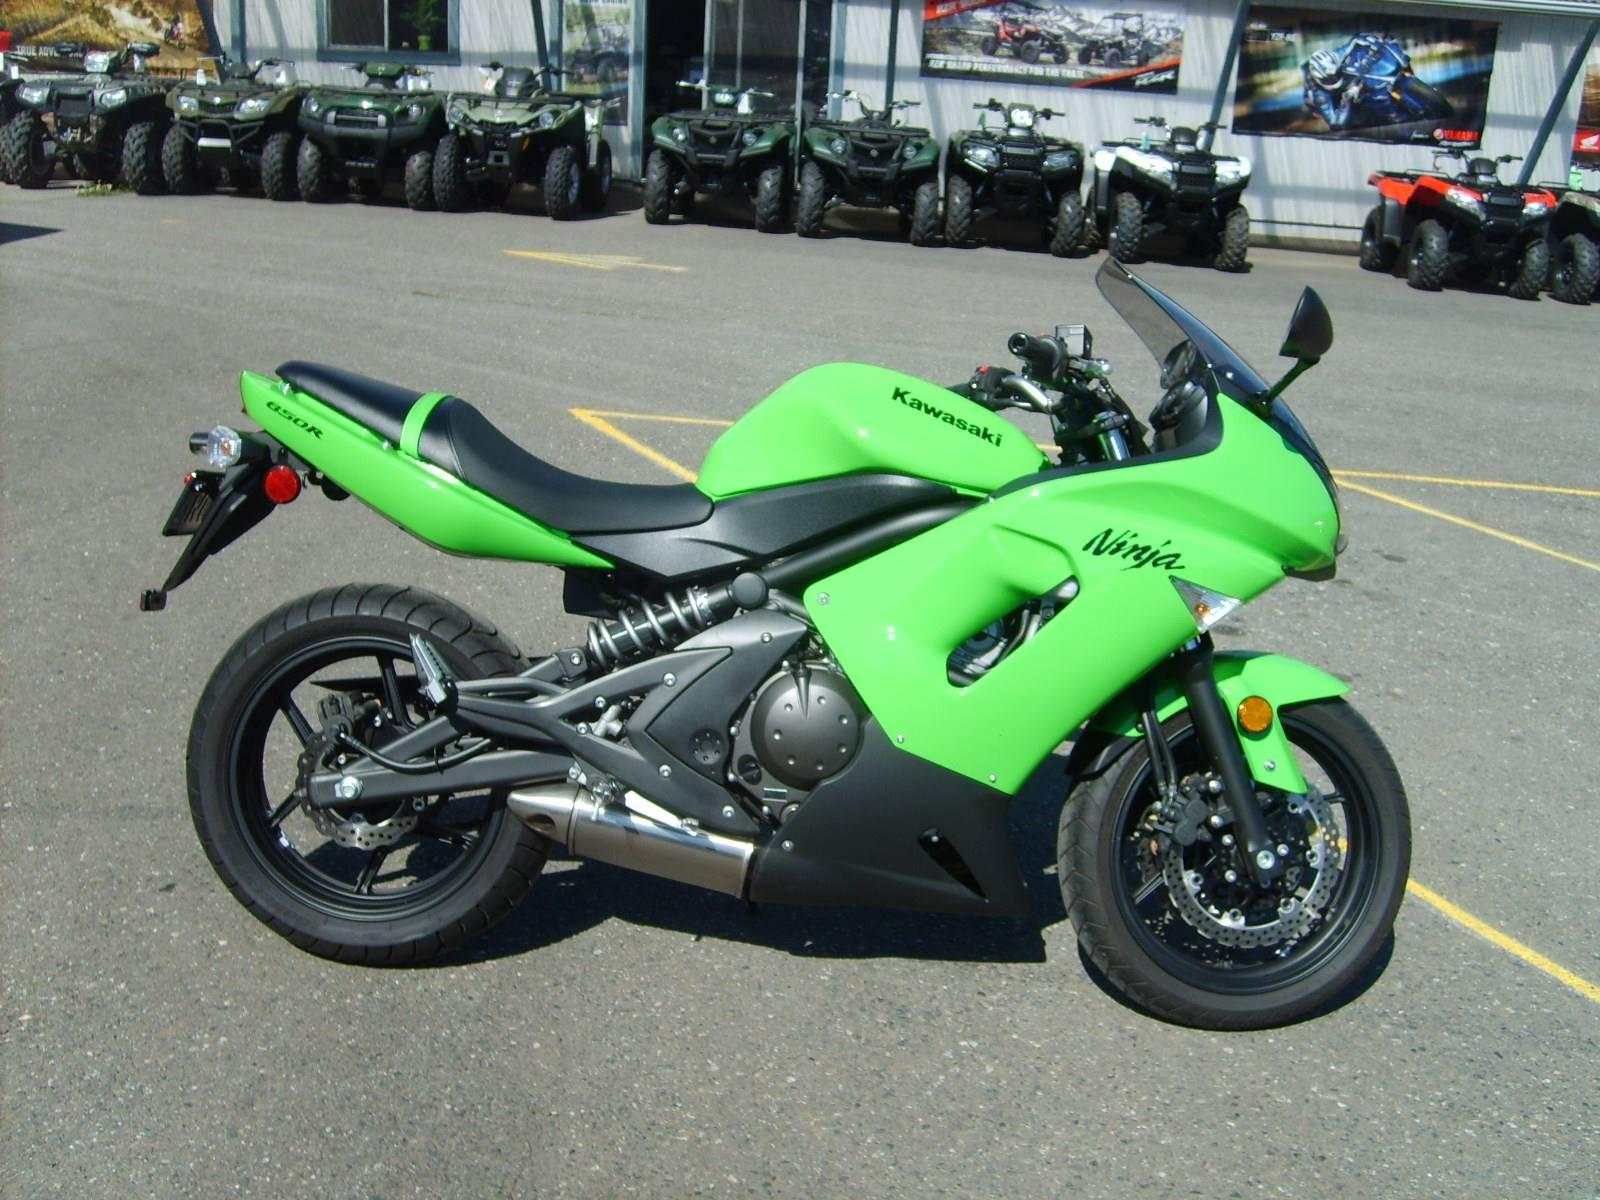 2008 Kawasaki NinjaR 650R In Port Angeles Washington